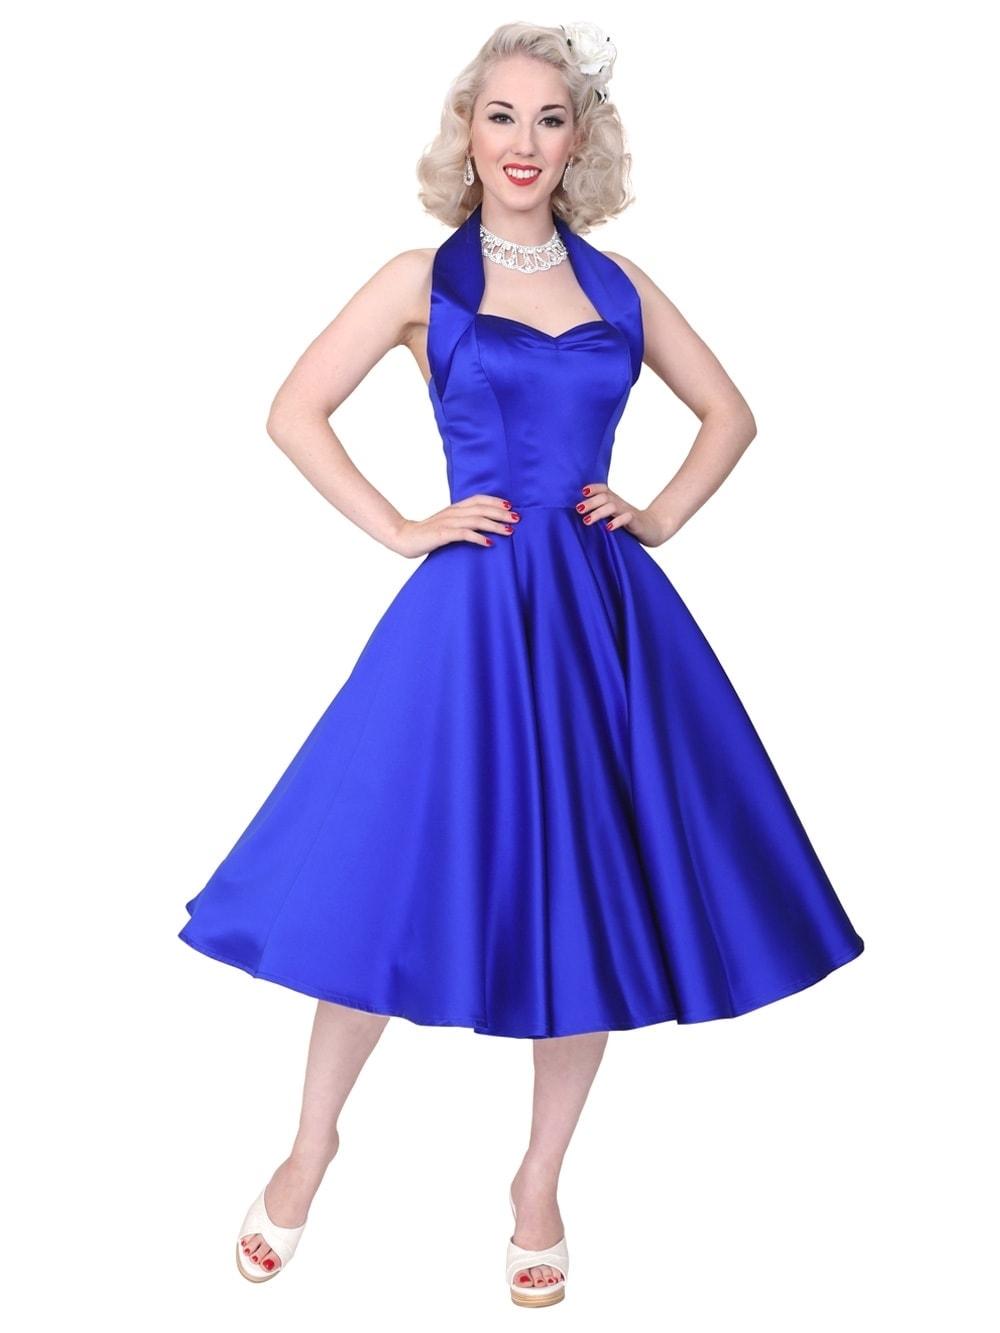 e866505d 1950s Halterneck Royal Duchess Dress from Vivien of Holloway